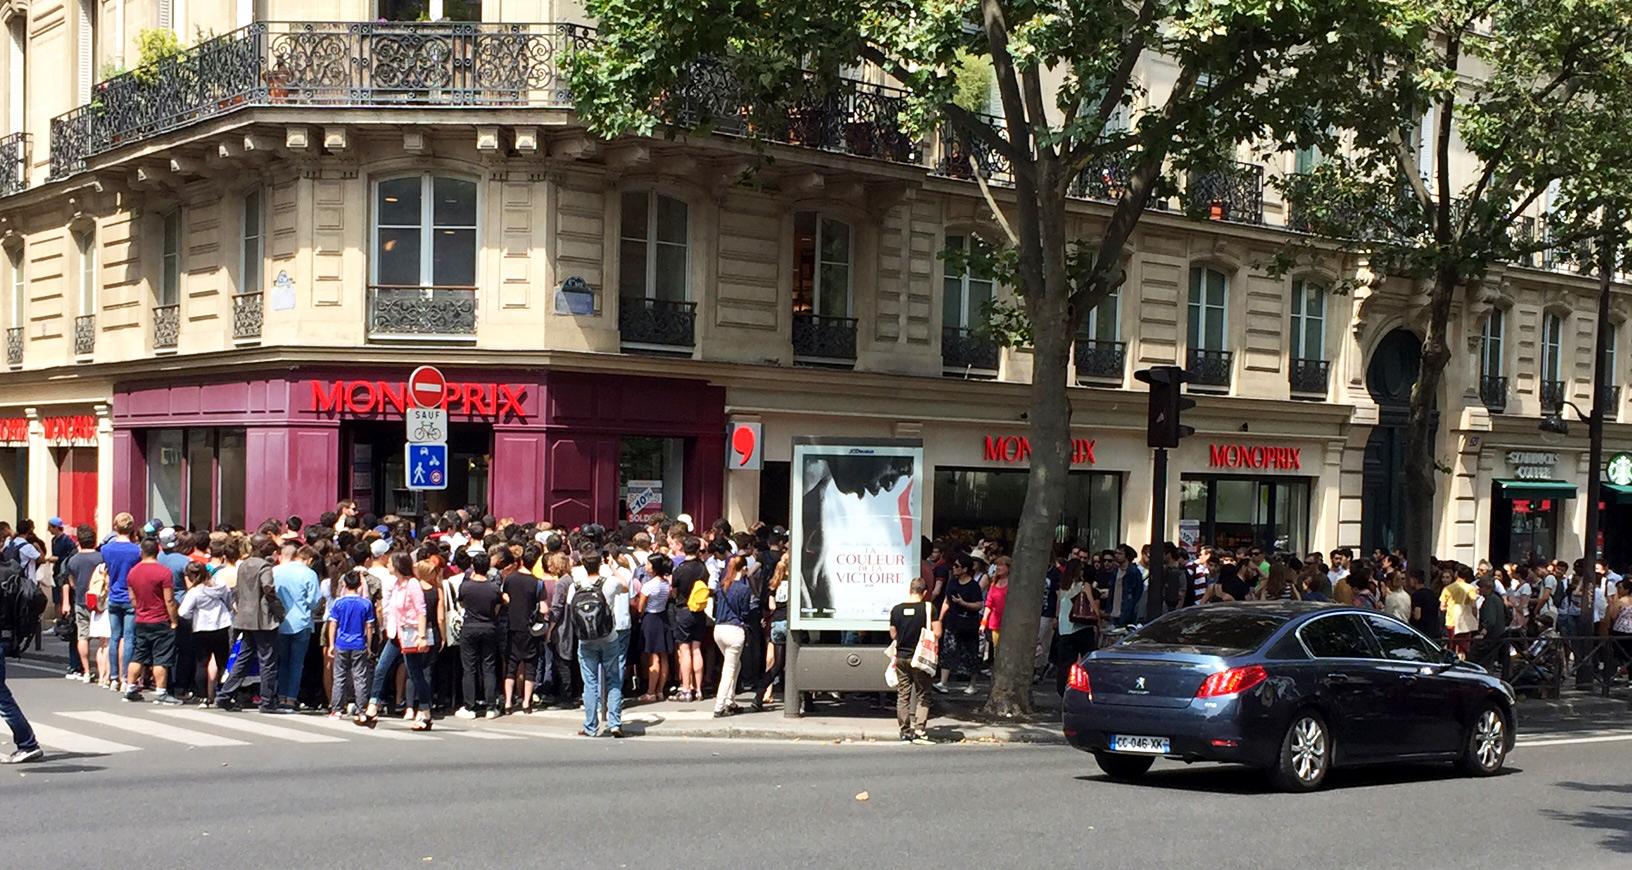 Part of the huge line at a Monoprix store for a Pokémon GO prize